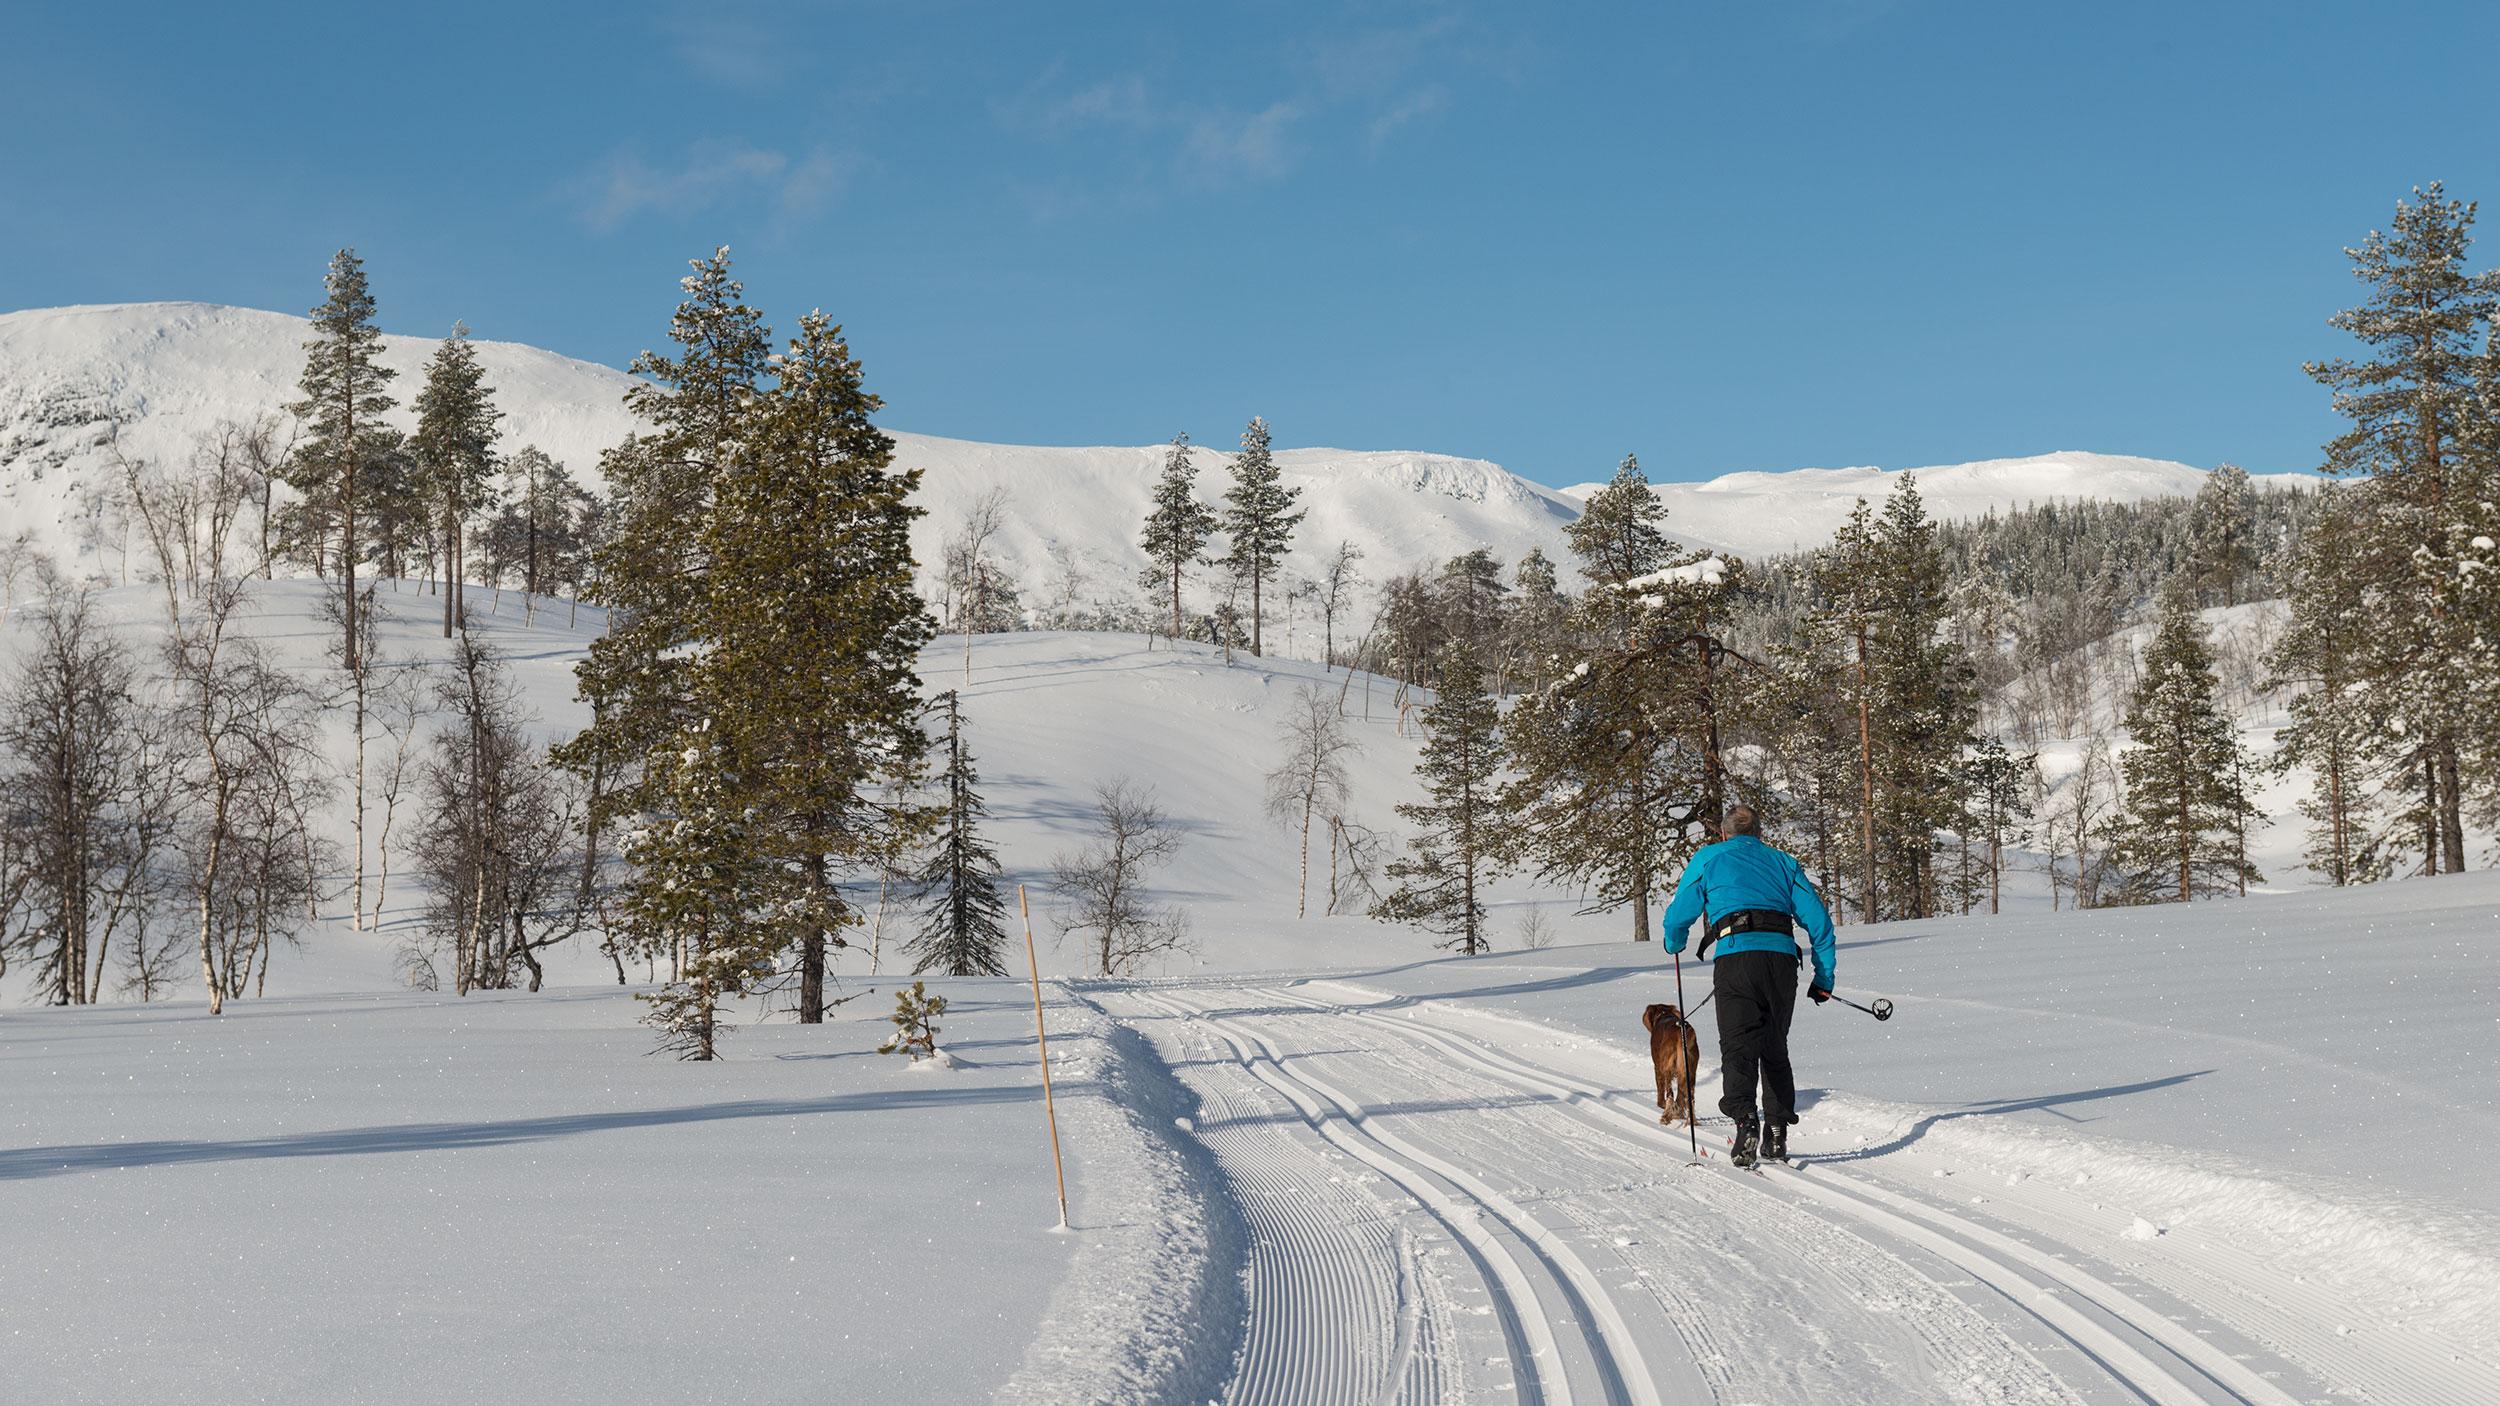 Skiløper_Sørbølfjell_SVA4306.jpg